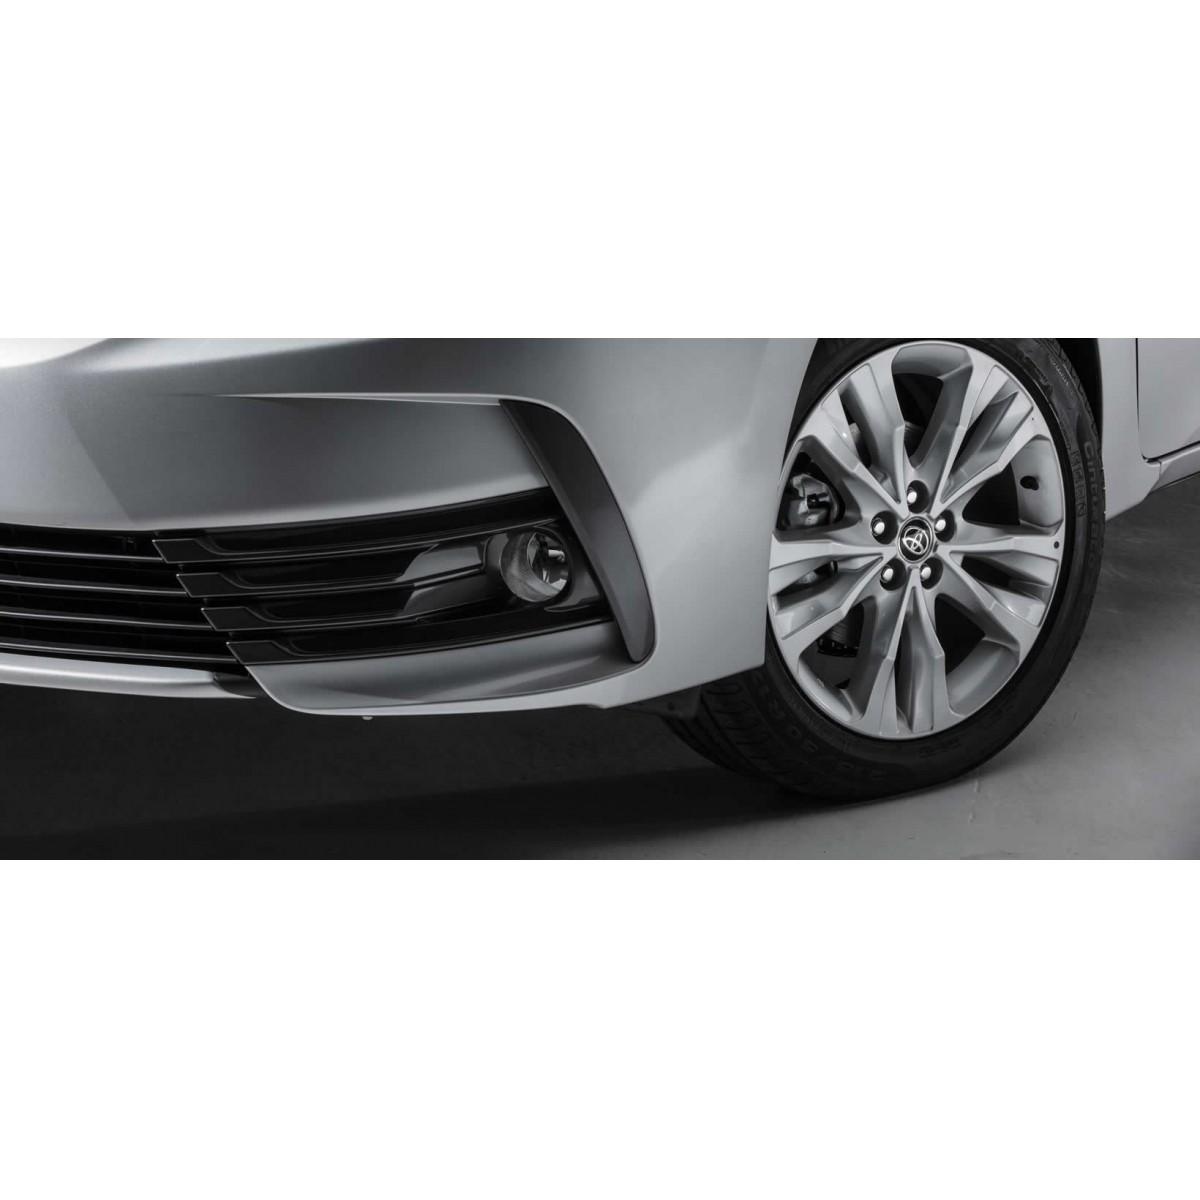 Kit Farol de Milha Neblina Toyota Corolla 2017 2018 - Interruptor Modelo Original